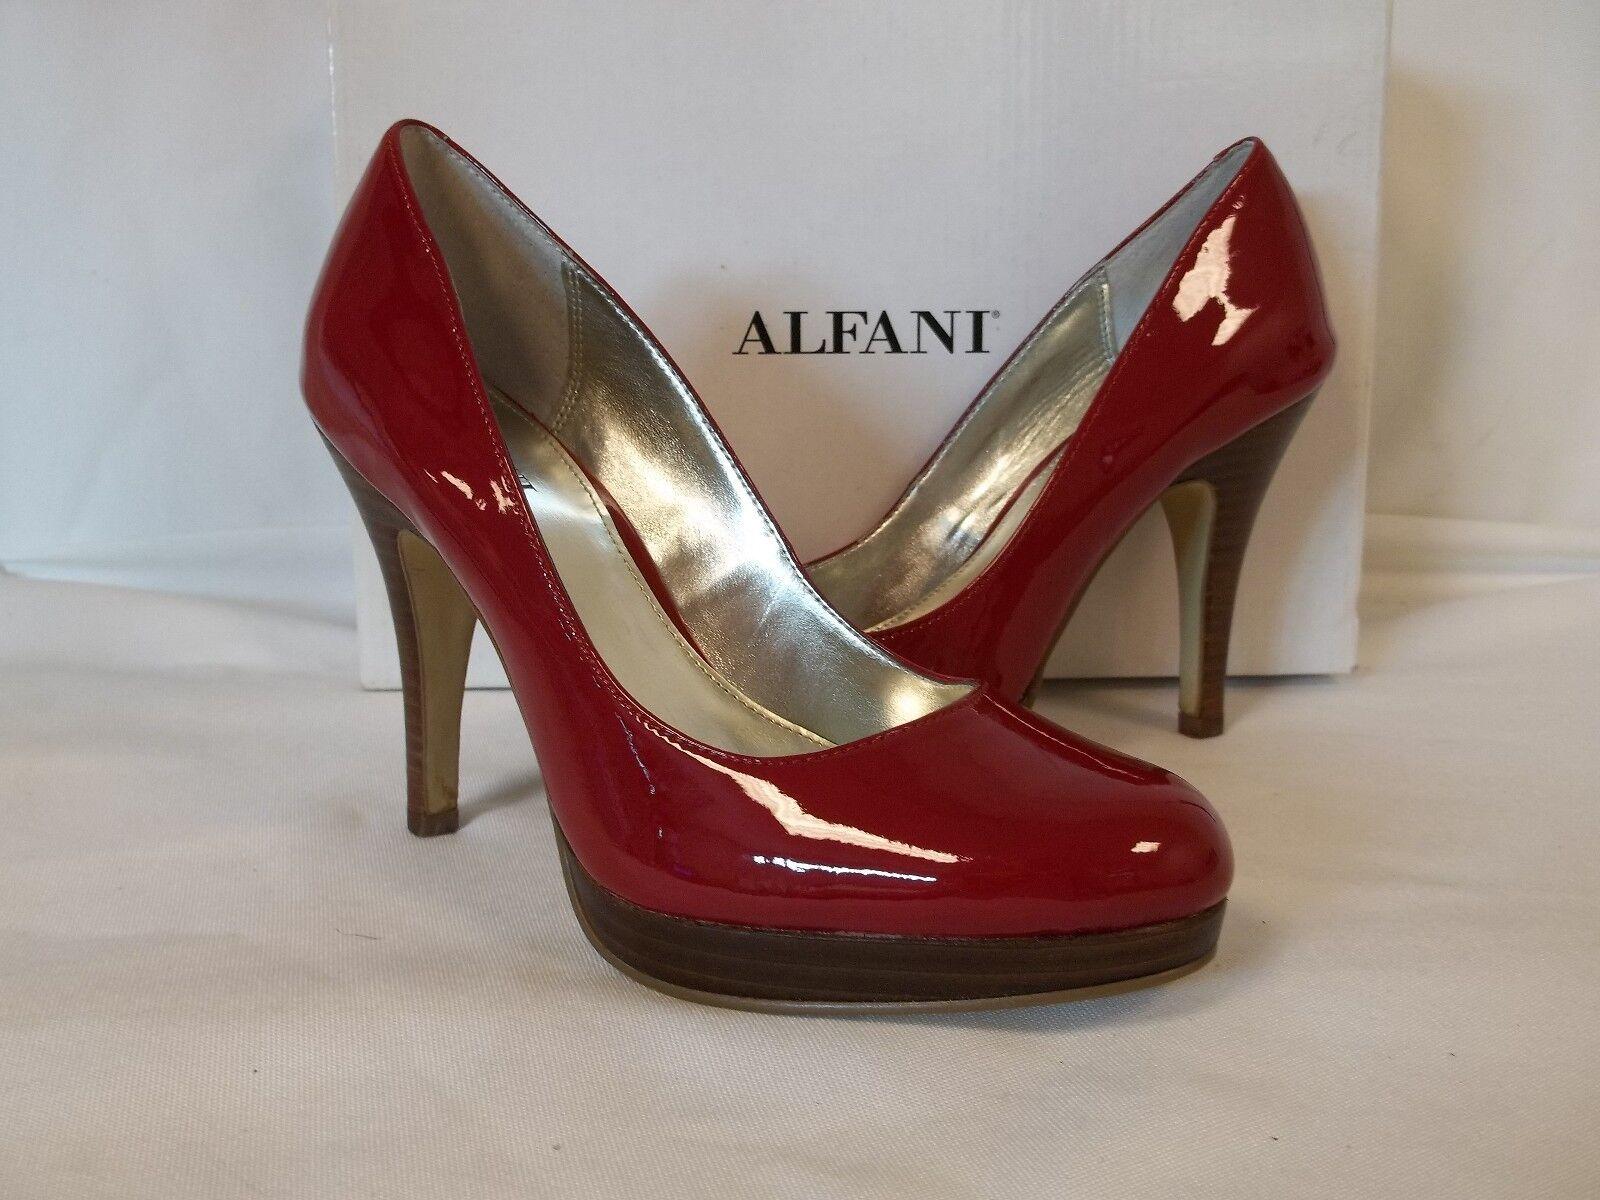 Alfani 6 M Maddy Cherry ROT Heels NEU Damenschuhe Schuhes